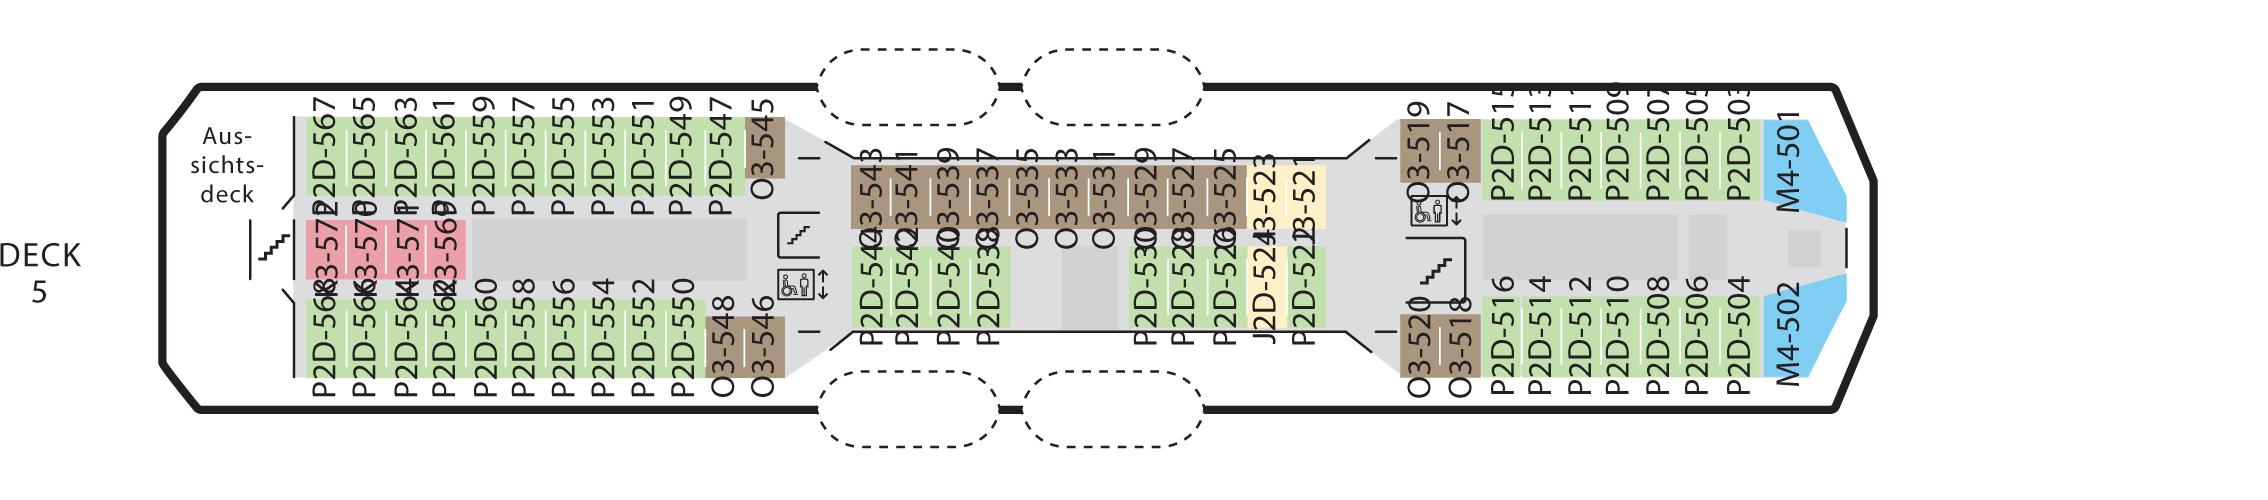 Kong-Harald-deckplan